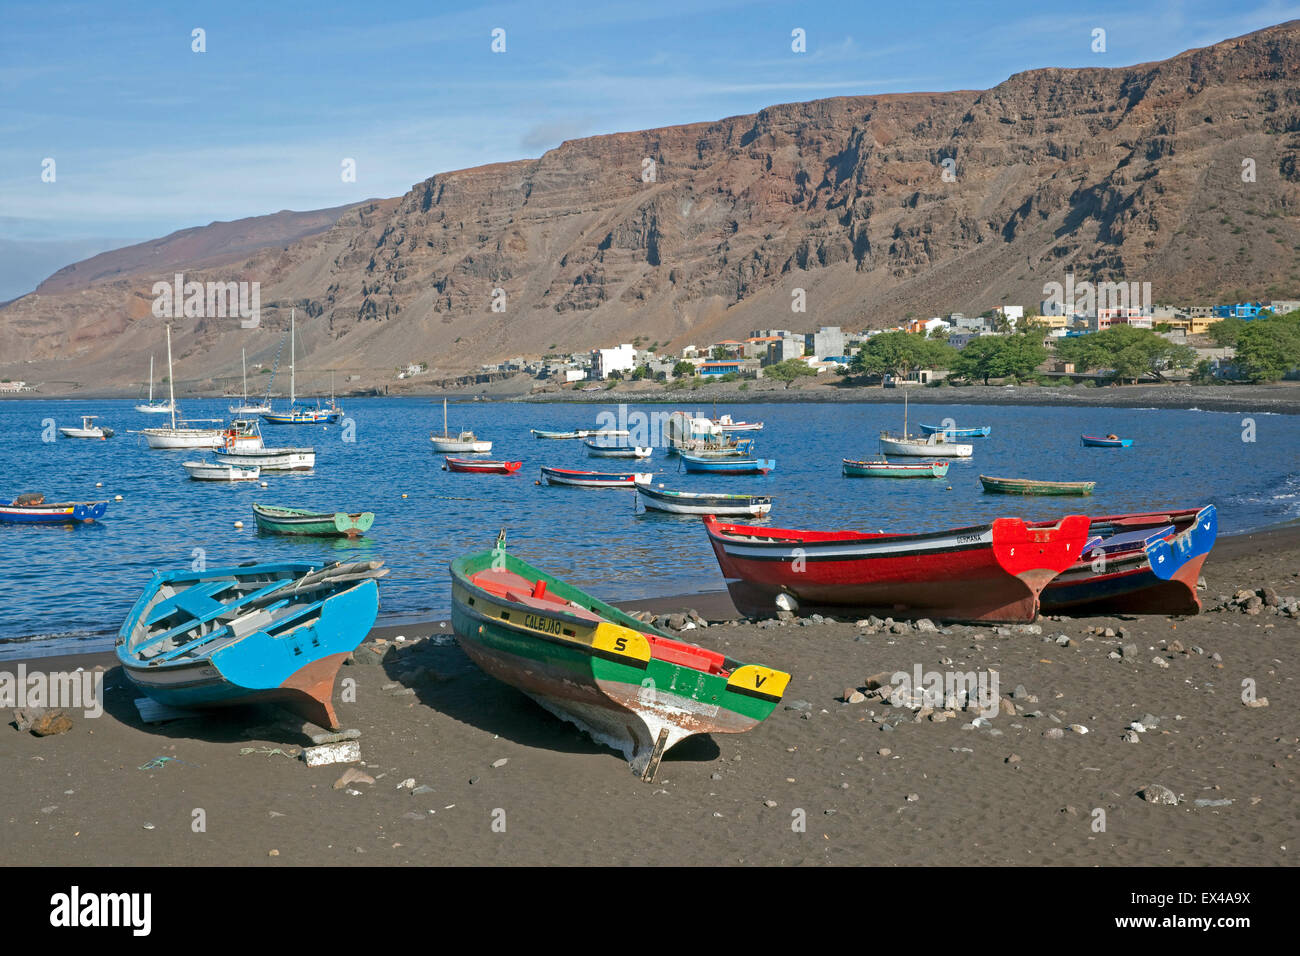 Colourful wooden fishing boats on the black sand beach of Tarrafal de São Nicolau on the island São Nicolau, - Stock Image